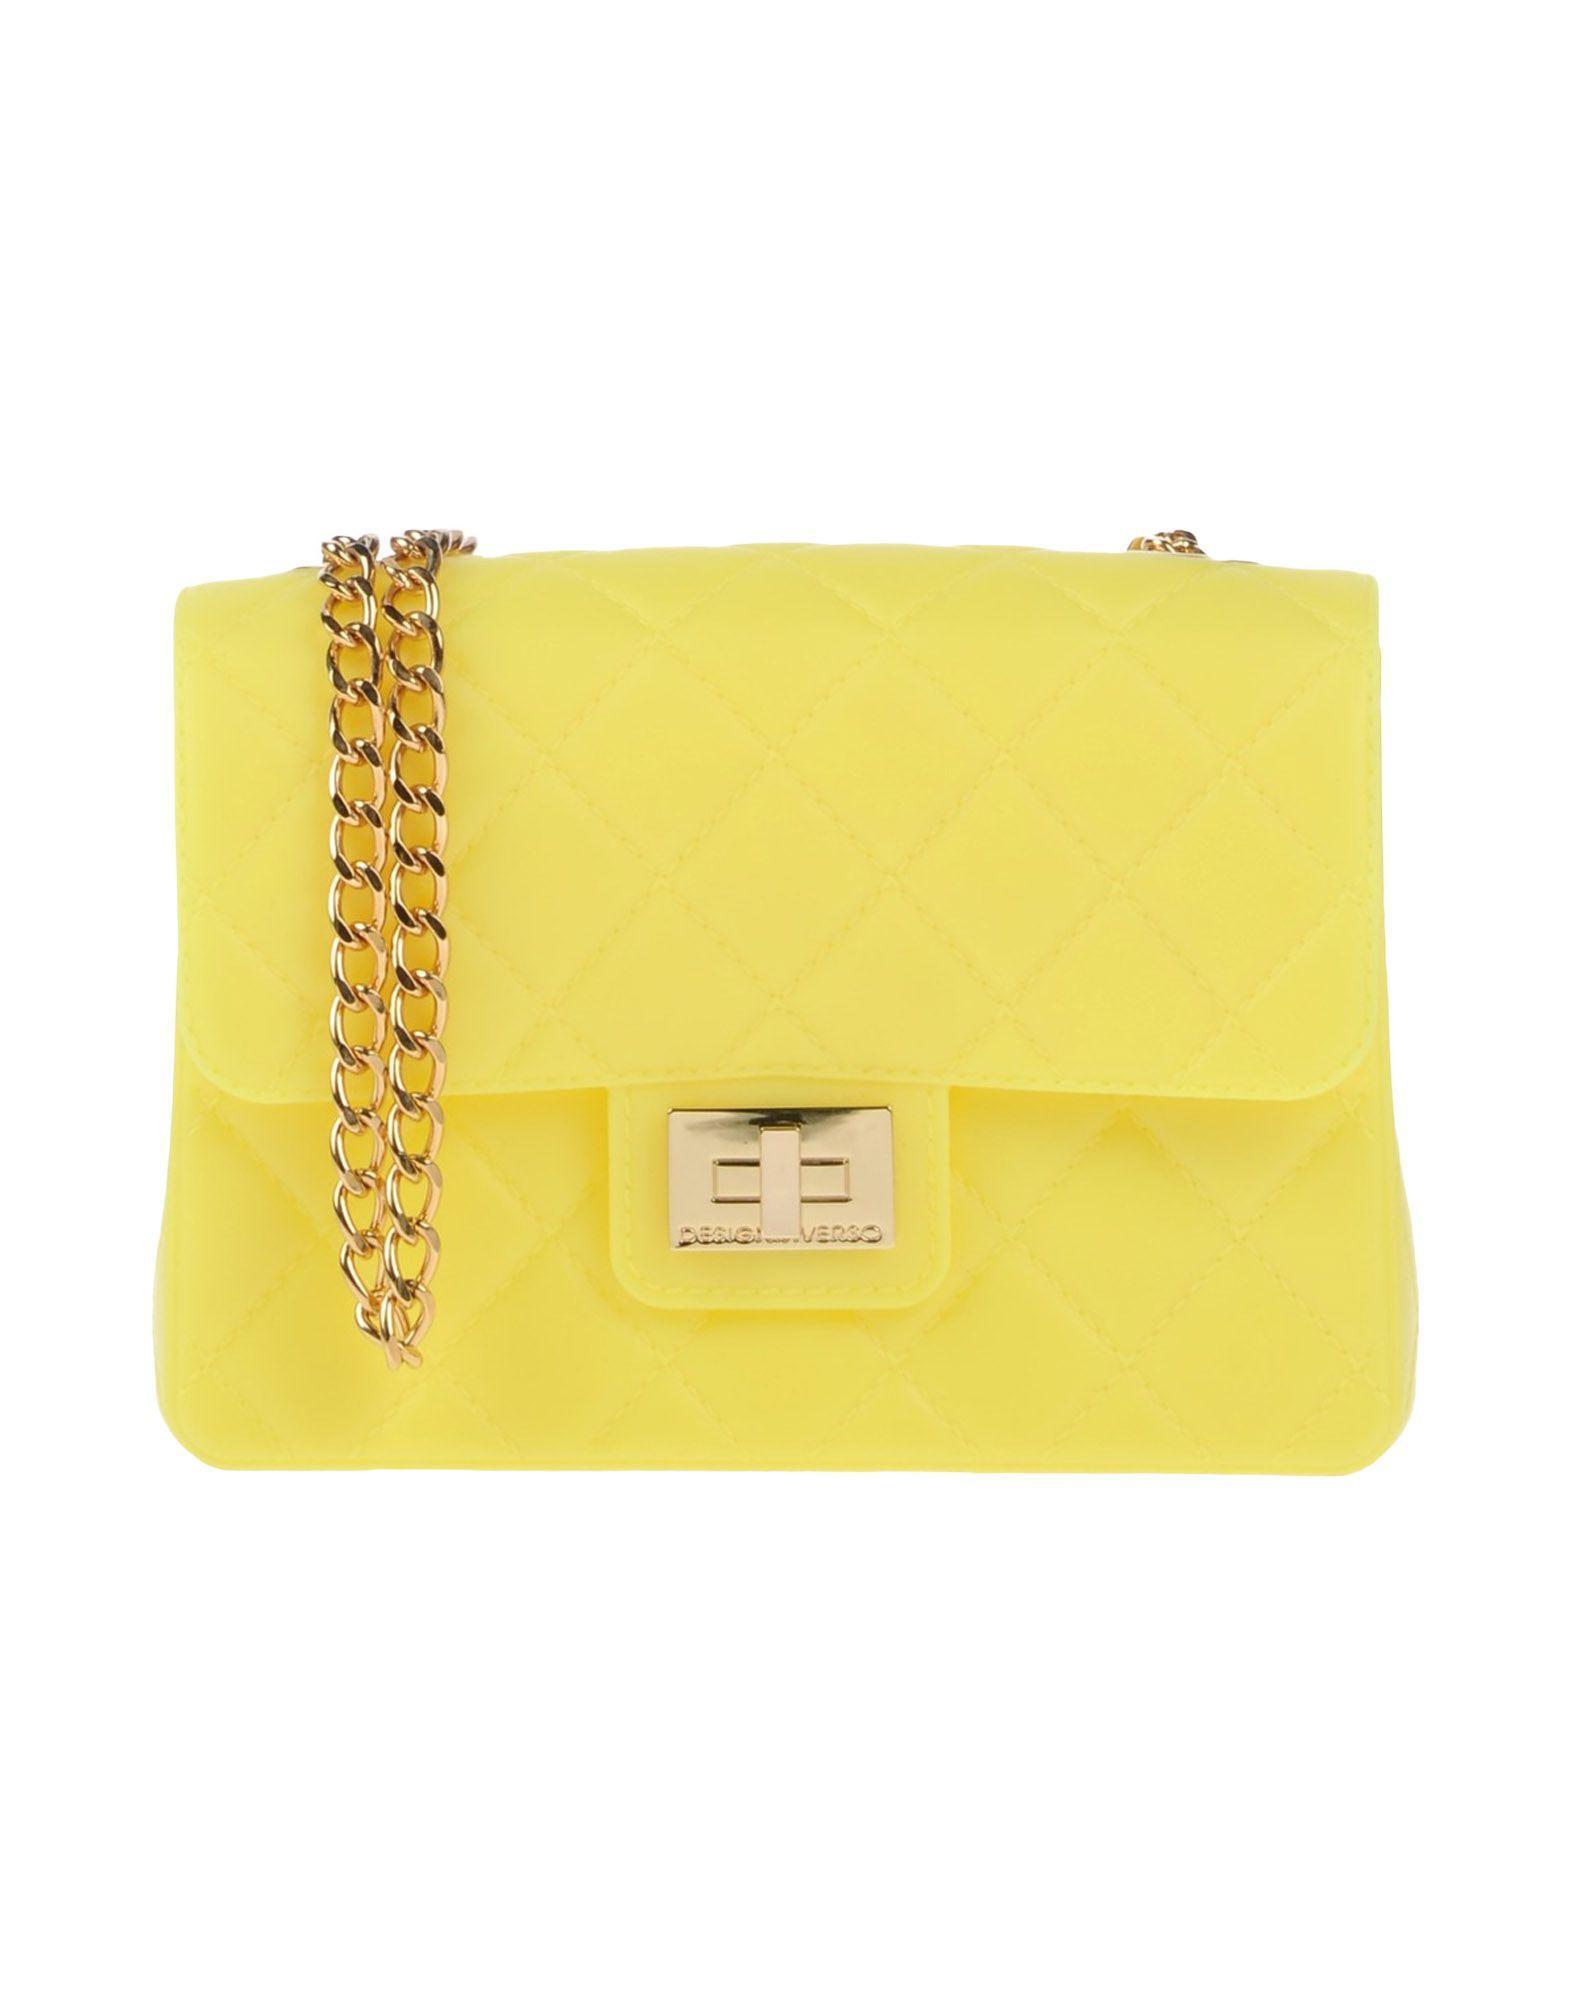 Designinverso In Yellow